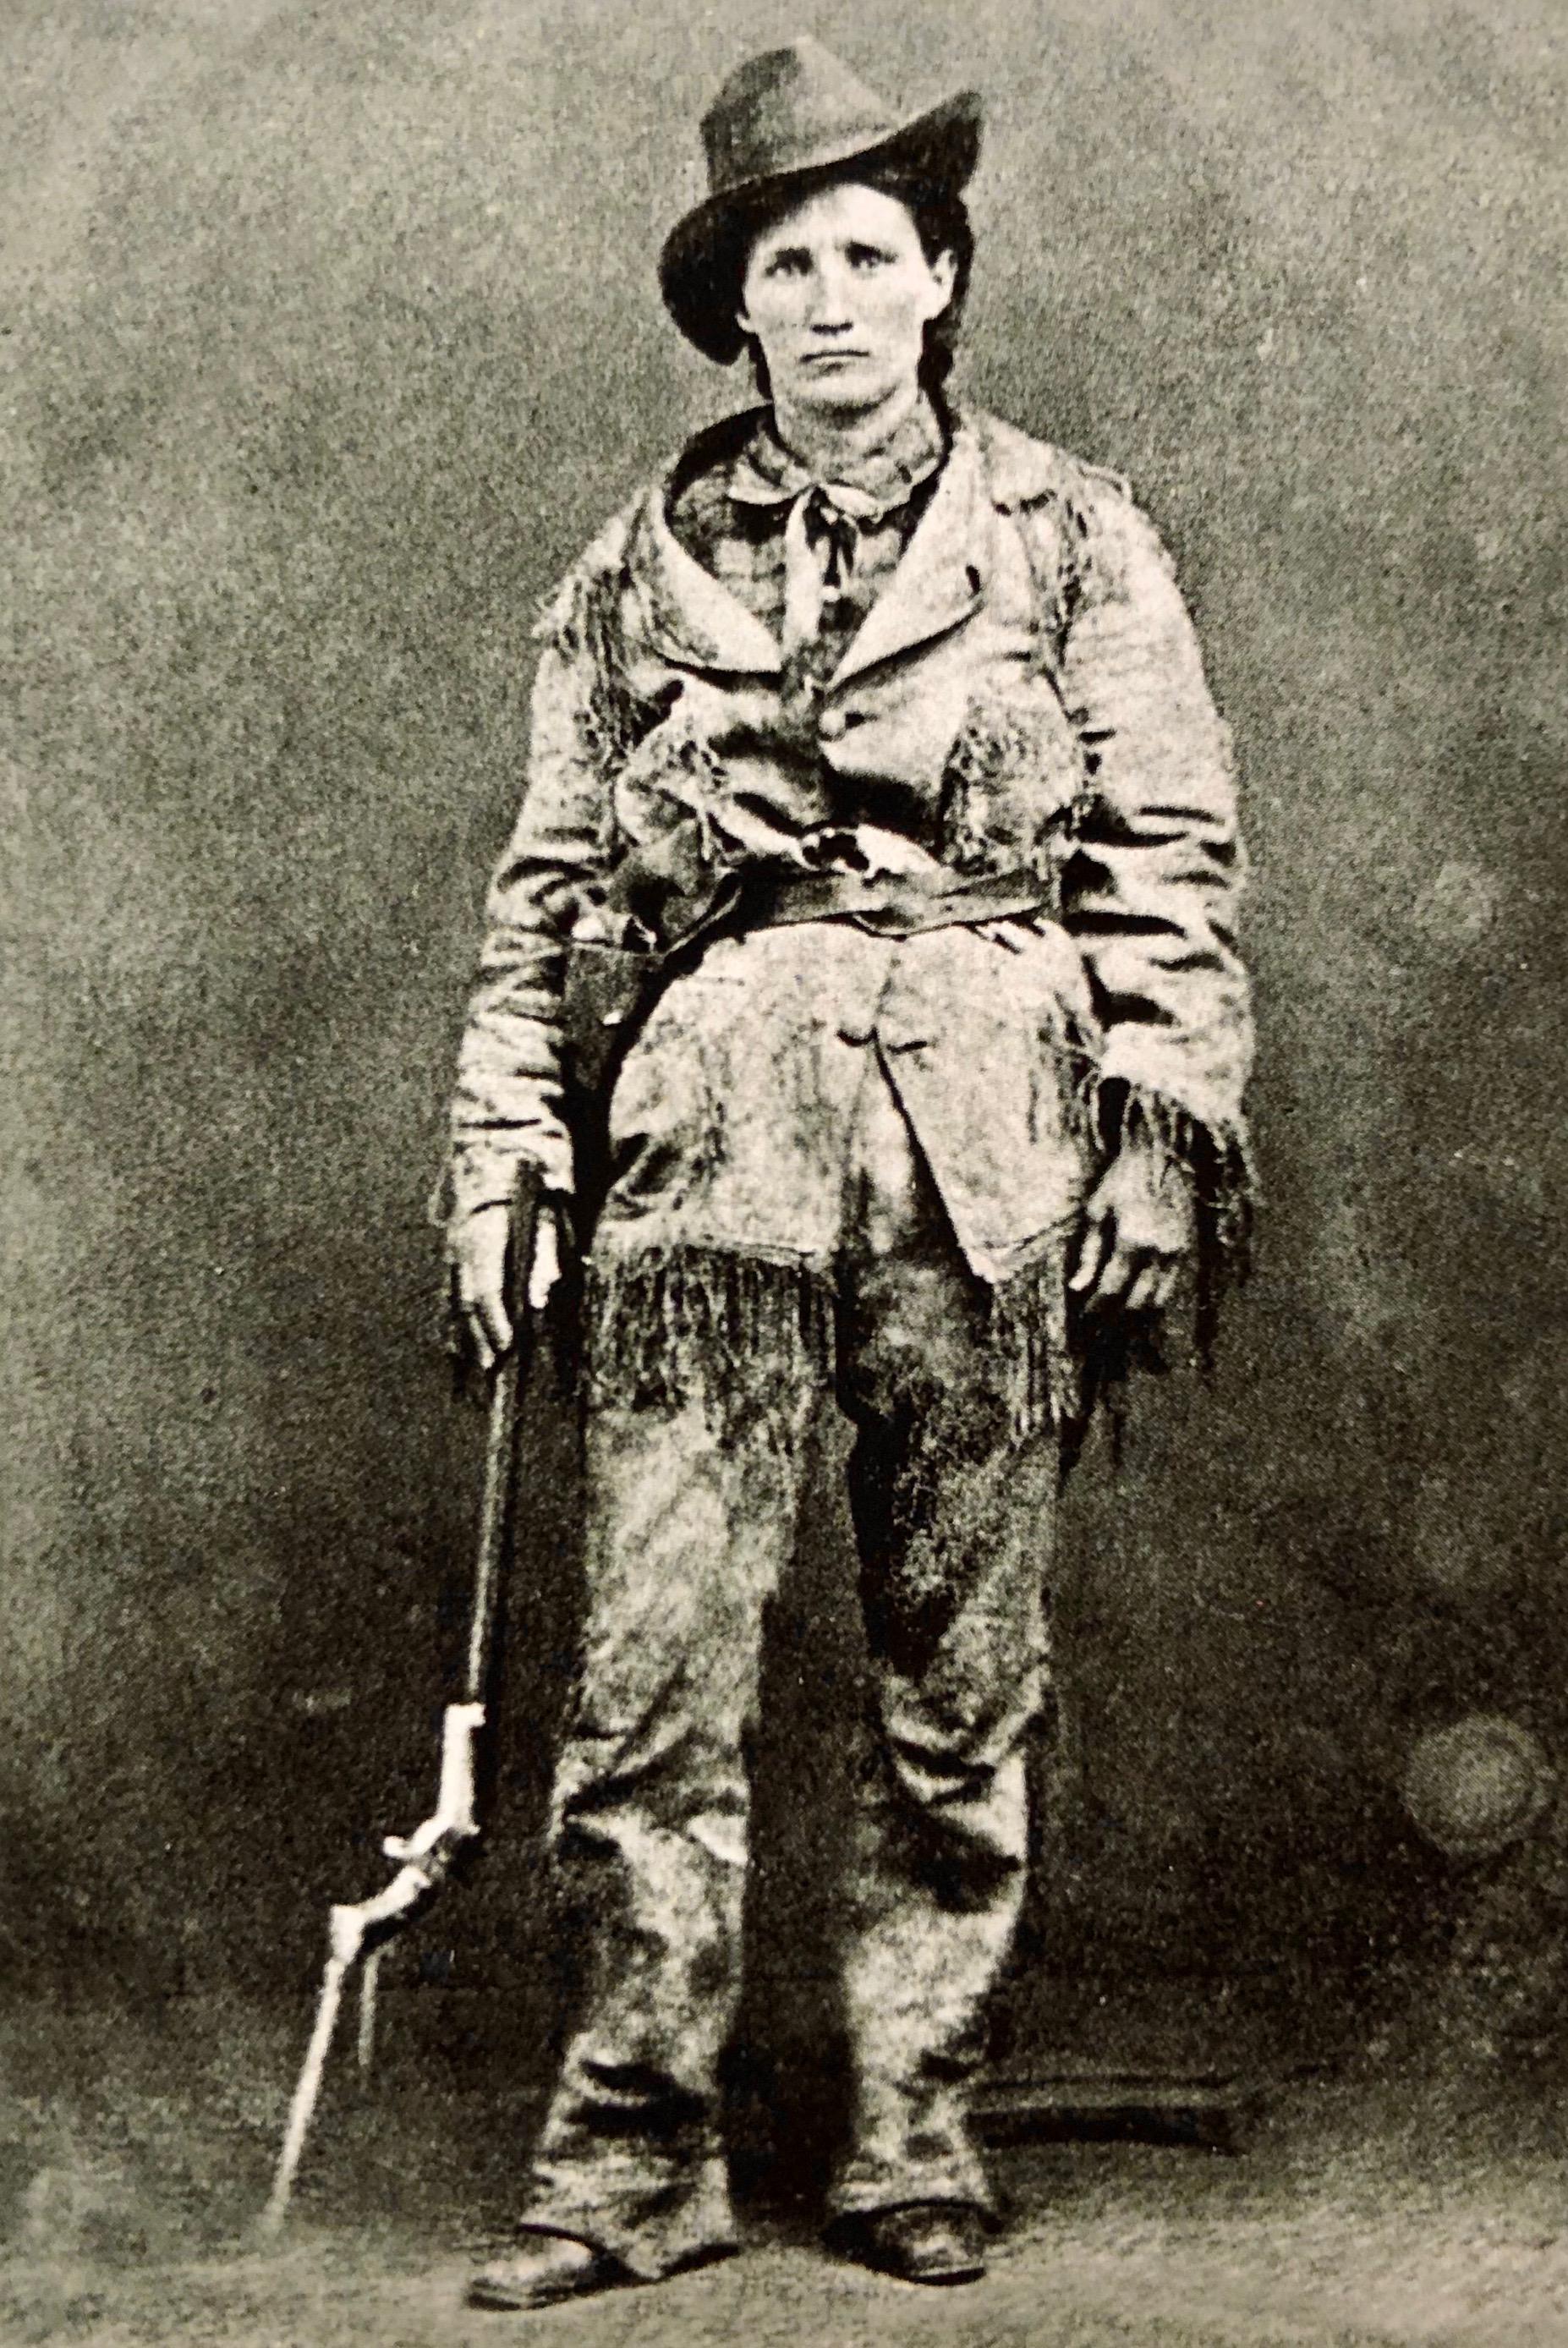 Calamity Jane frontierswoman